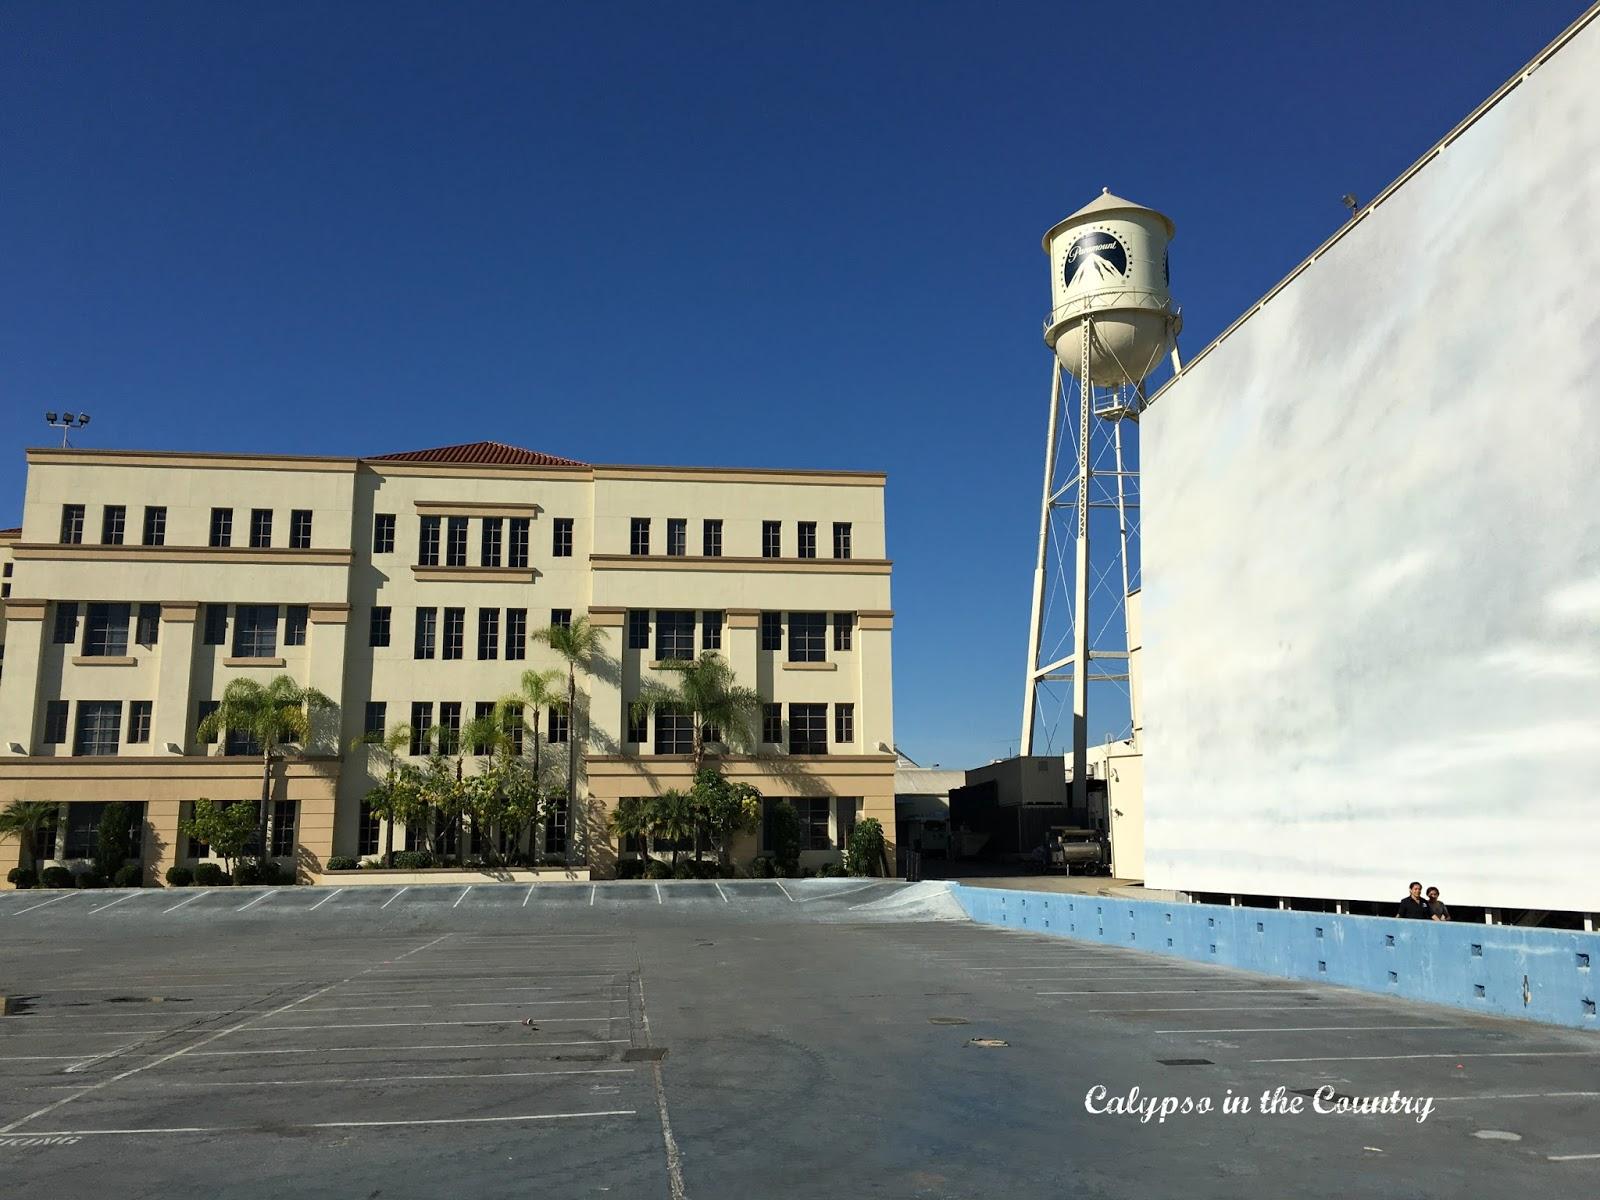 Parking Lot used for ocean scenes at Paramount Studios